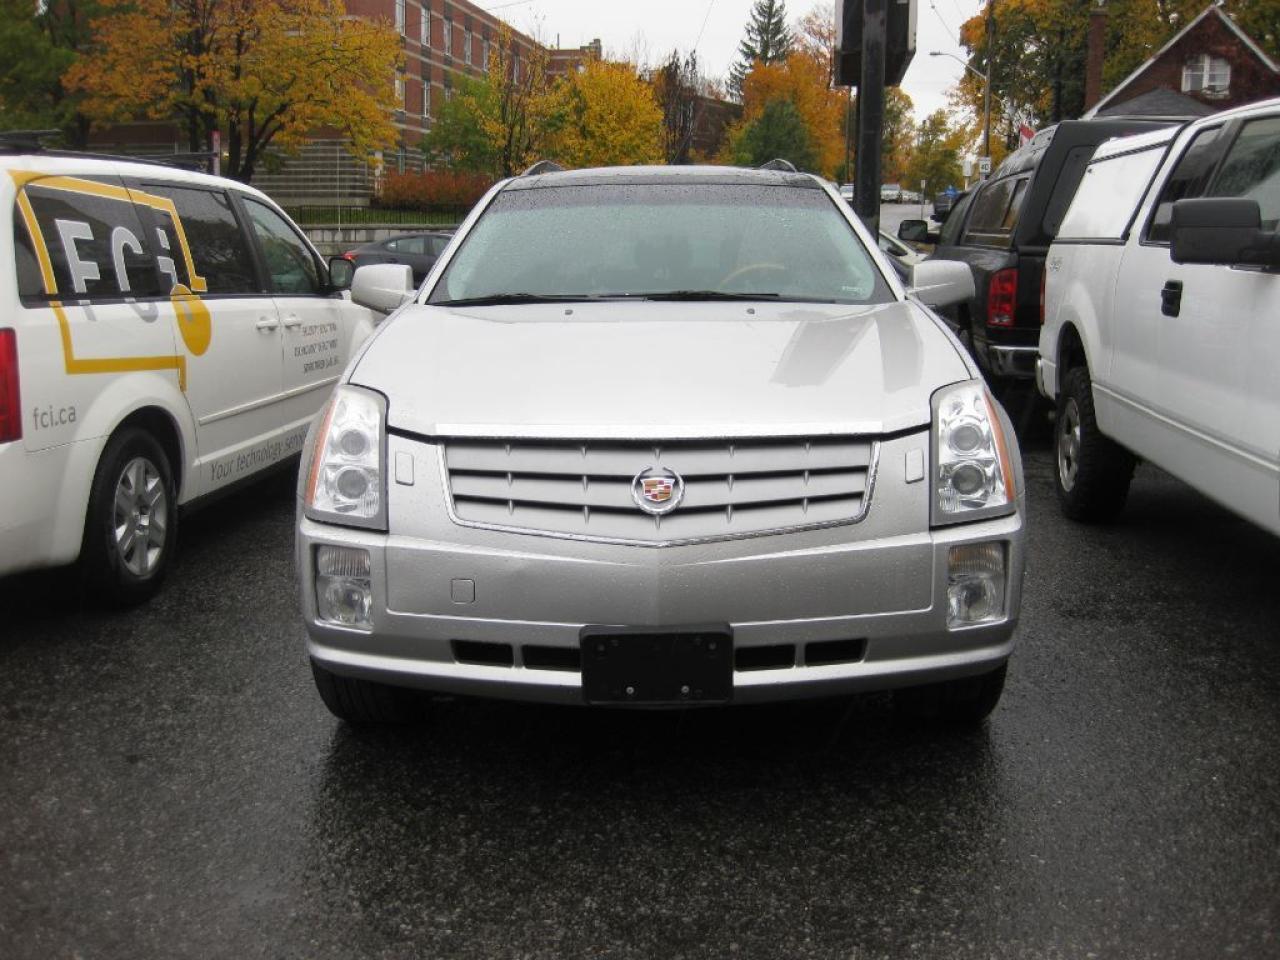 2007 Cadillac SRX AWD, 7 pass, 8cyl, p/w p/l dvd, nav, htd leather